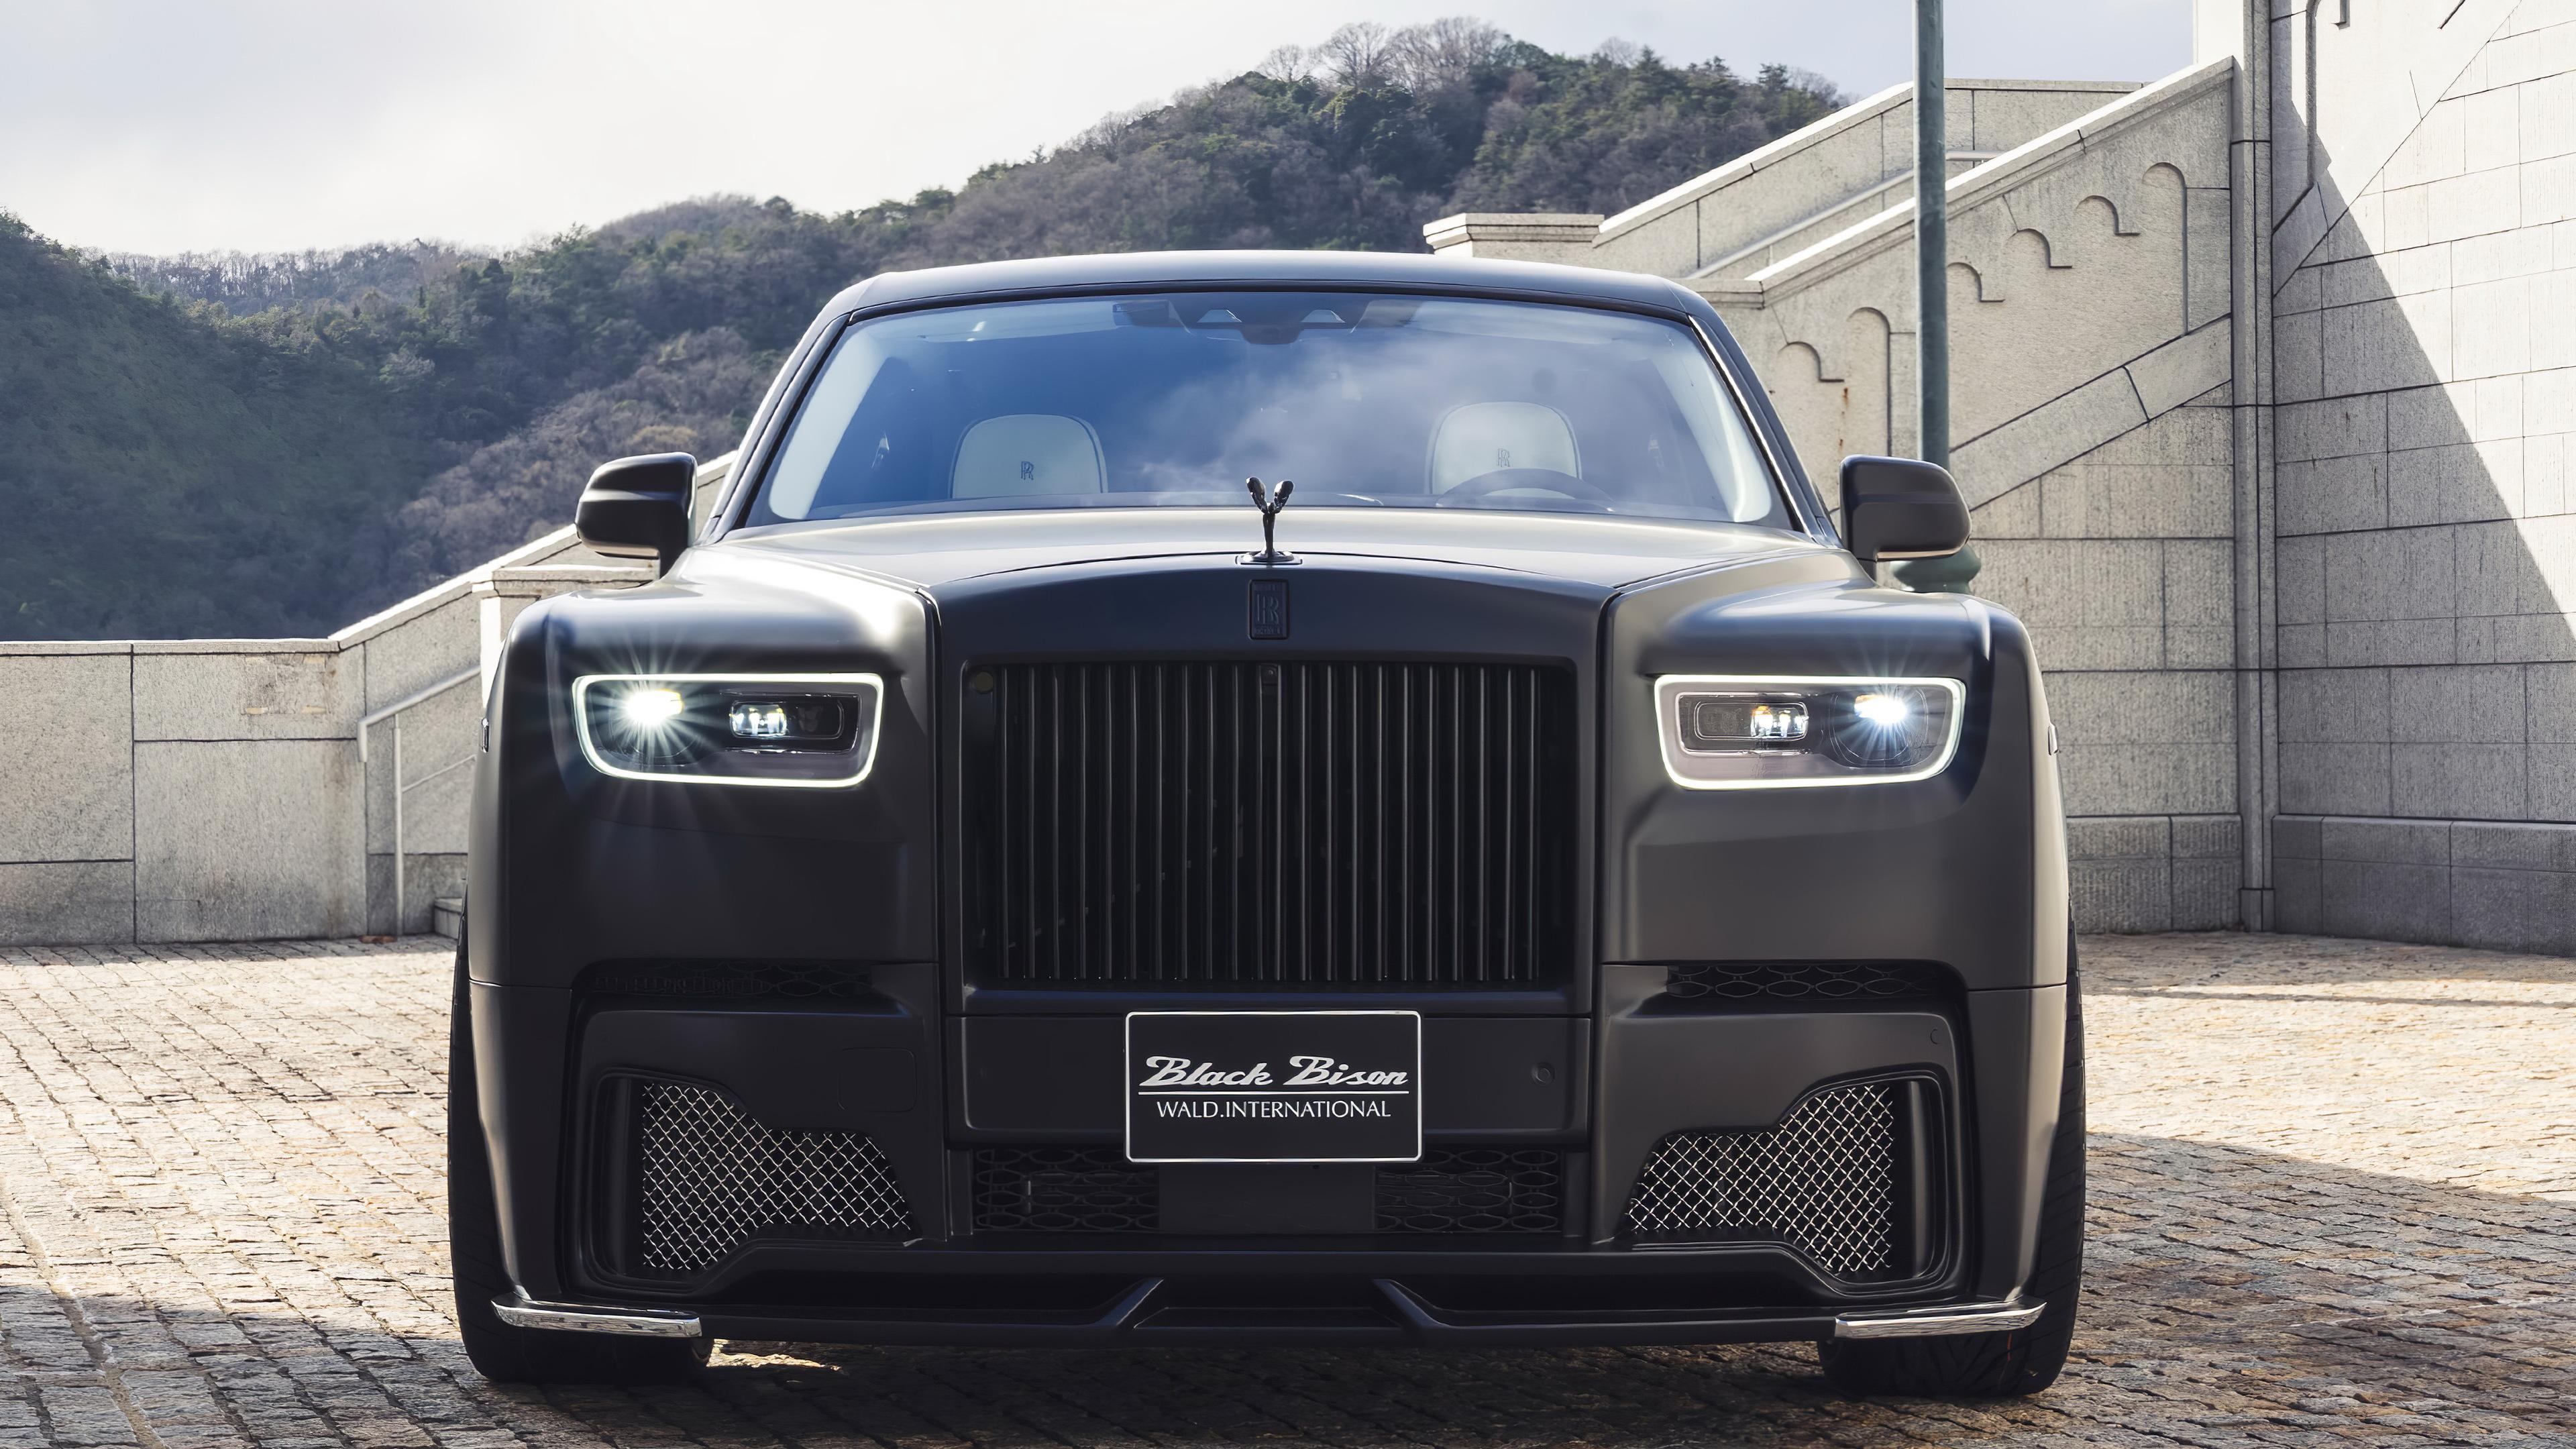 rolls royce phantom sports line black bison edition 2019 1562107919 - Rolls Royce Phantom Sports Line Black Bison Edition 2019 - rolls royce wraith wallpapers, rolls royce wallpapers, hd-wallpapers, cars wallpapers, 5k wallpapers, 4k-wallpapers